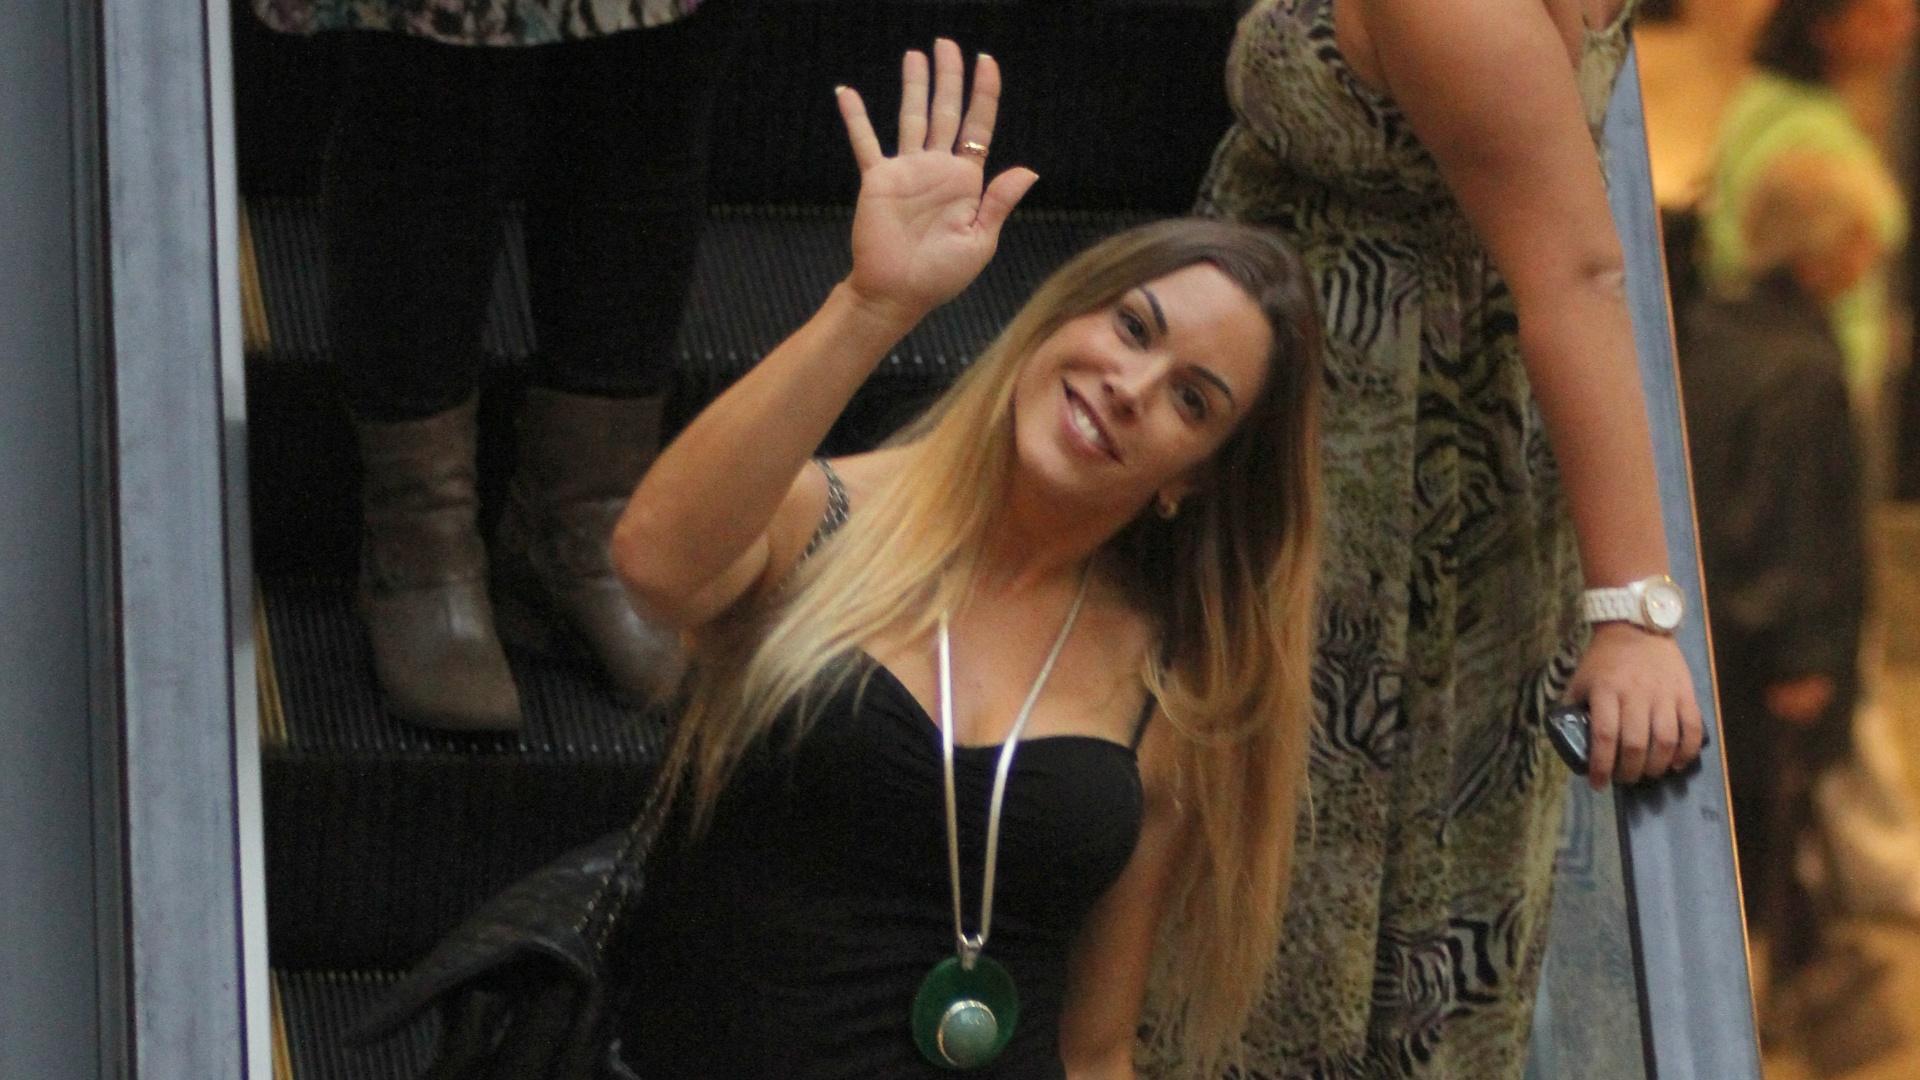 Joana Prado dá tchauzinho para fotógrafo no Rio (28/1/12)